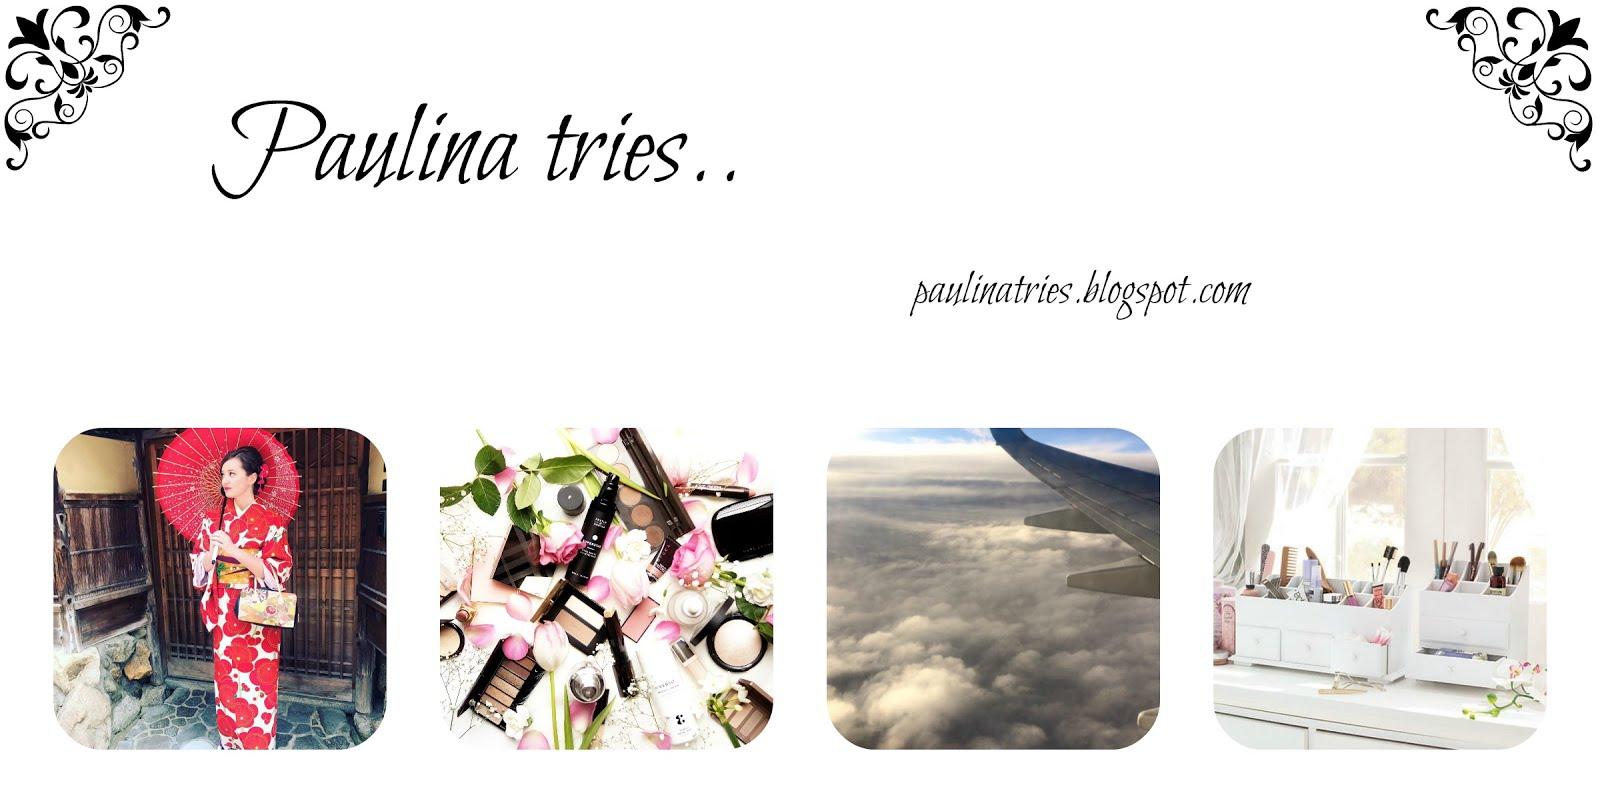 Paulina tries..